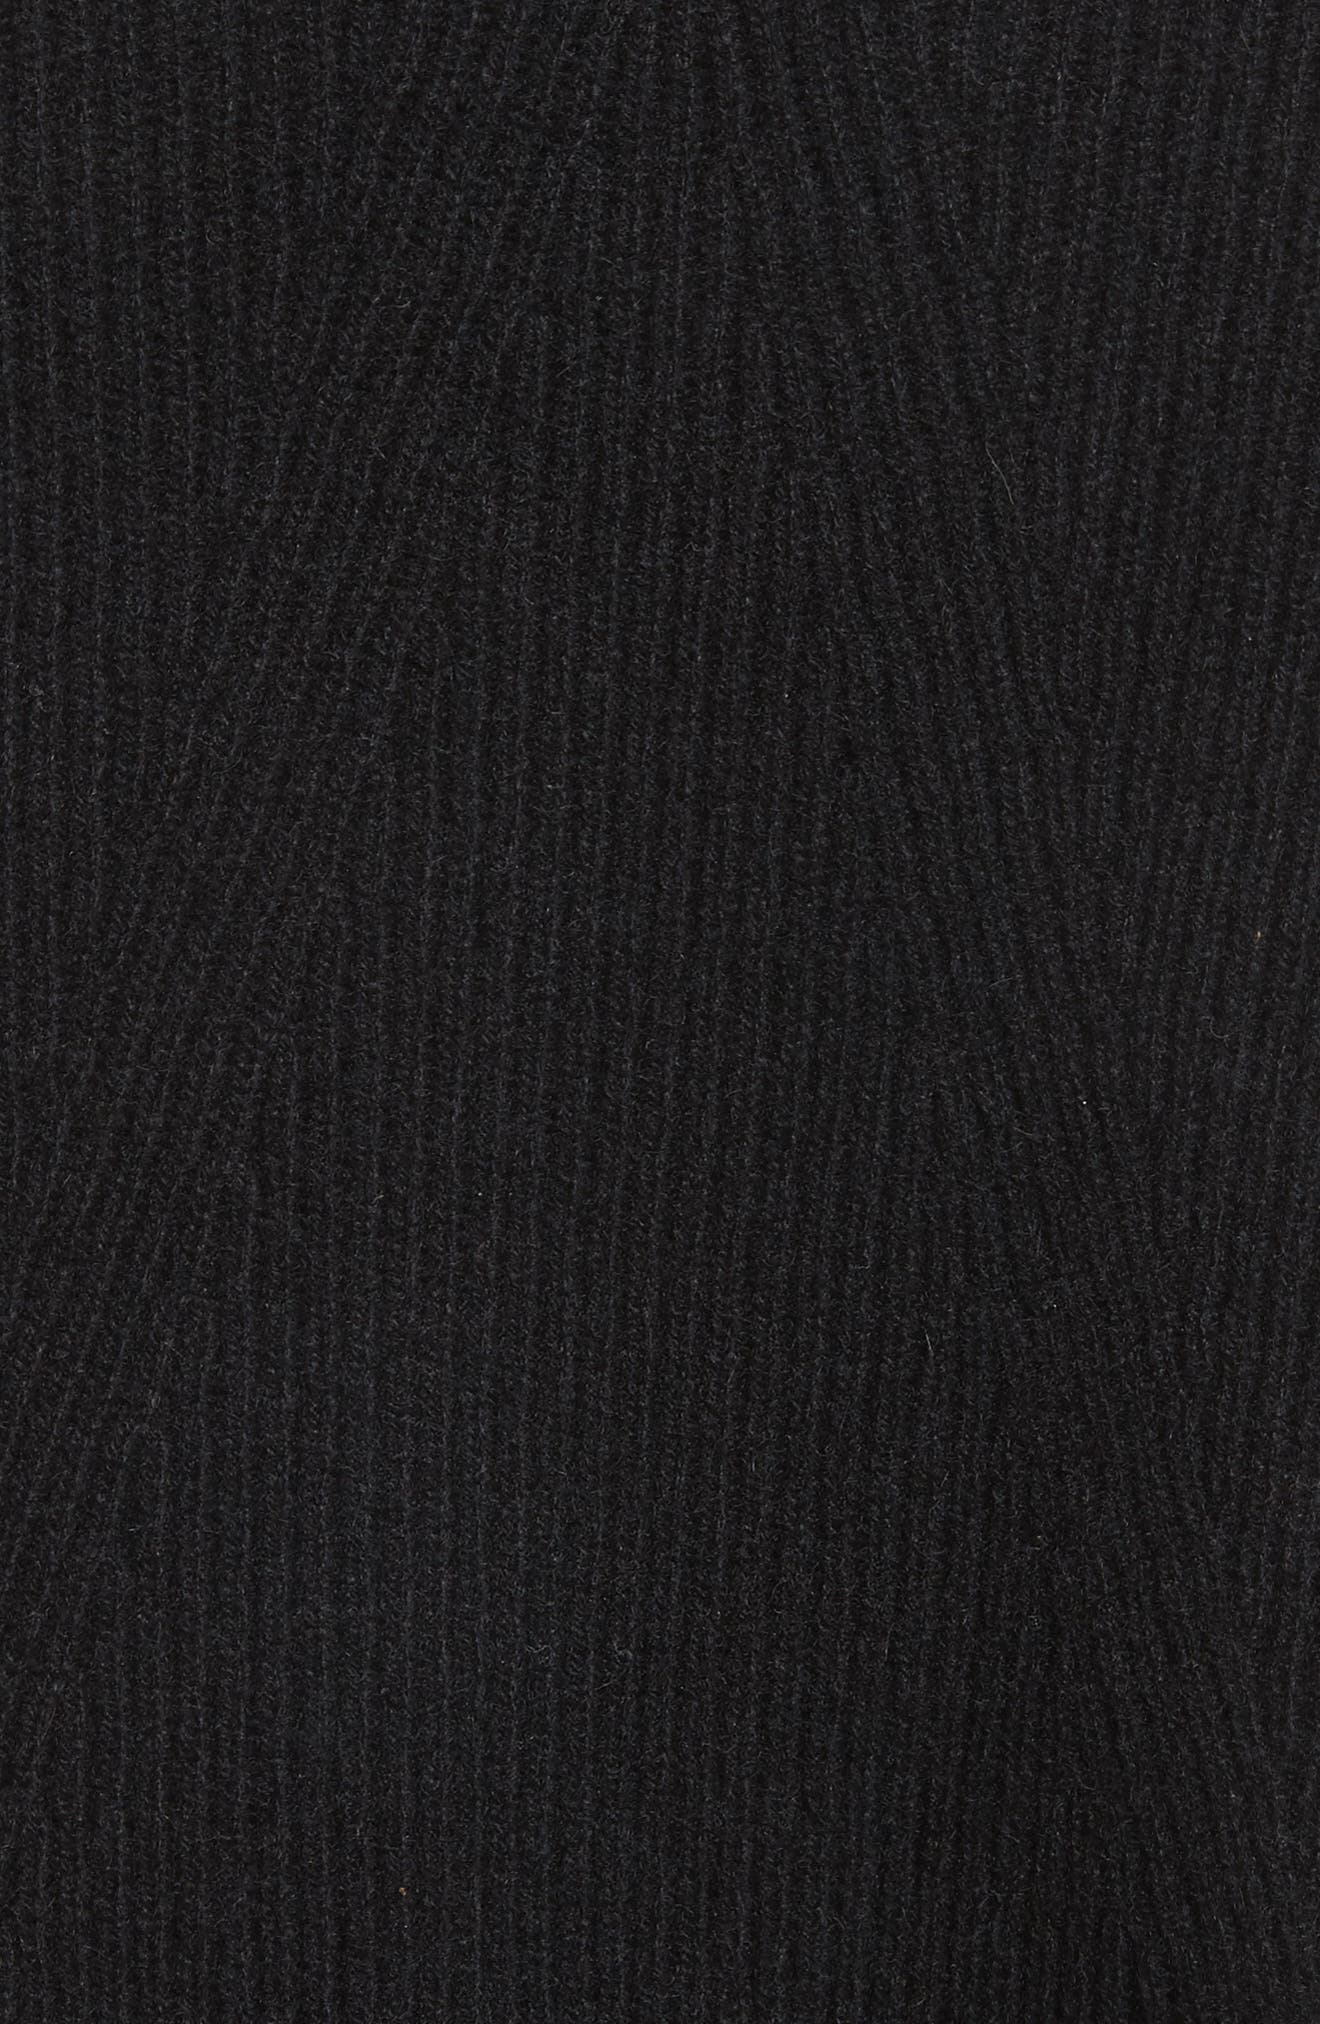 Ace Cashmere Crop Sweater,                             Alternate thumbnail 5, color,                             001